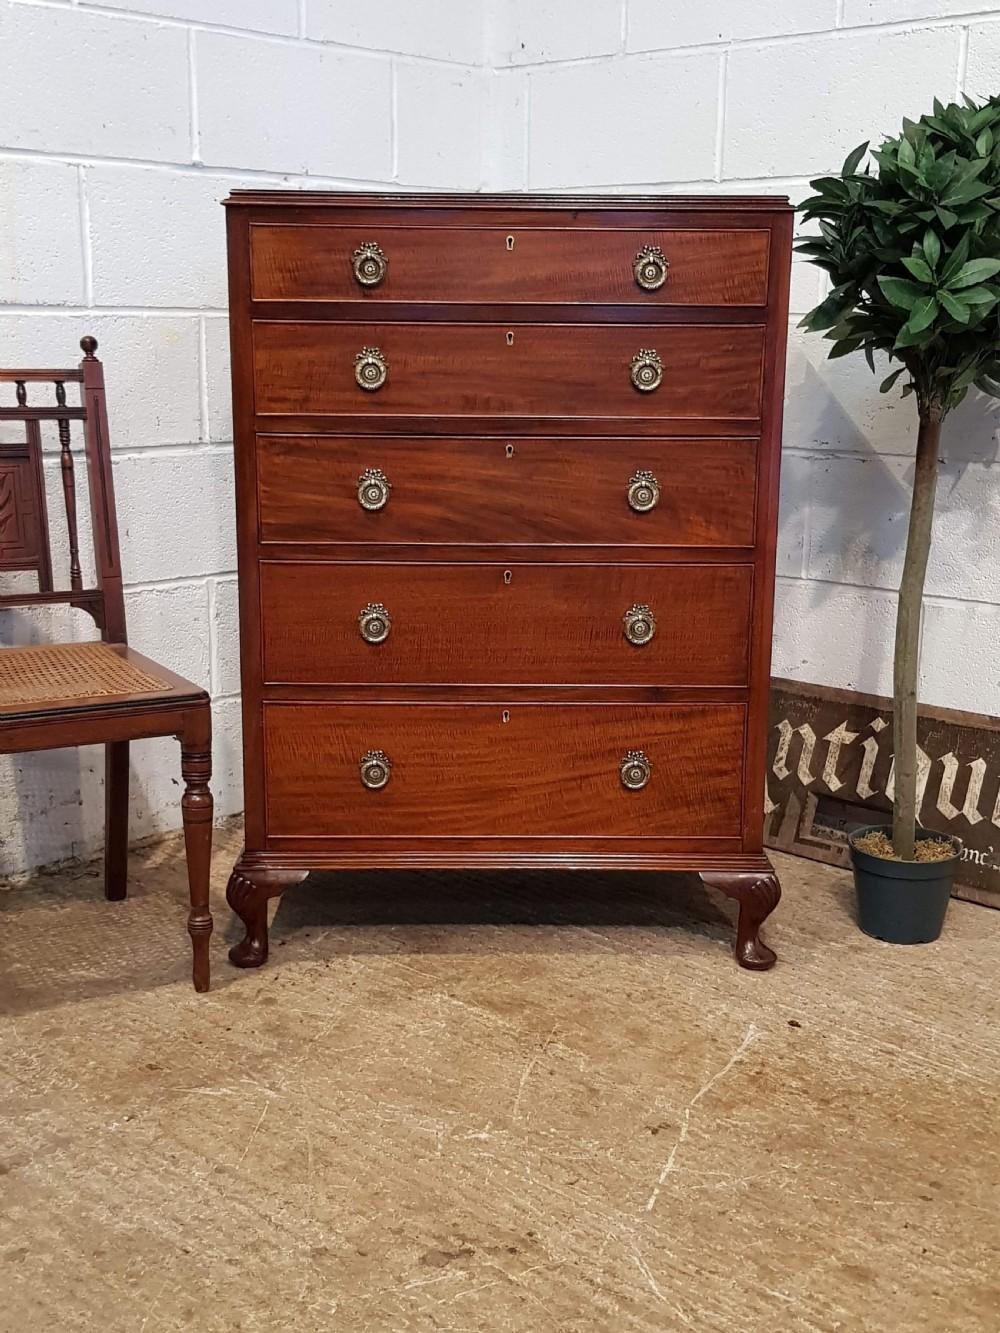 antique edwardian regency mahogany tall narrow chest of drawers c1900